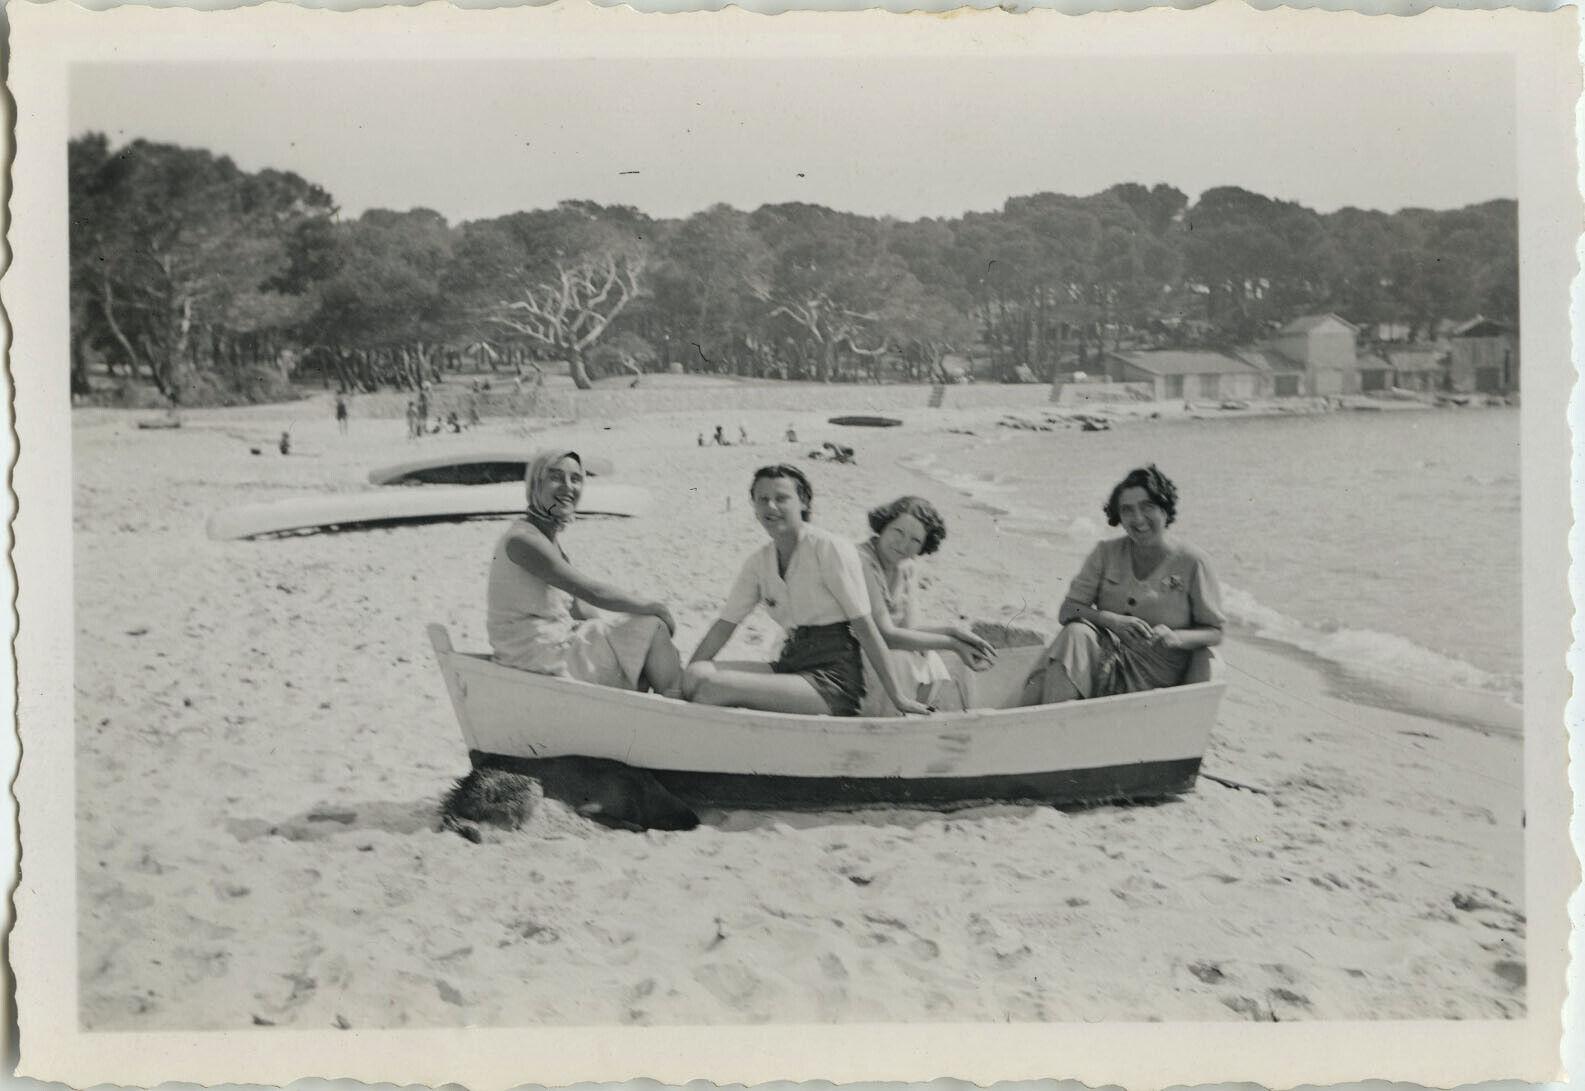 Photo ancienne - vintage snapshot - plage bateau barque groupe gag mode - boat